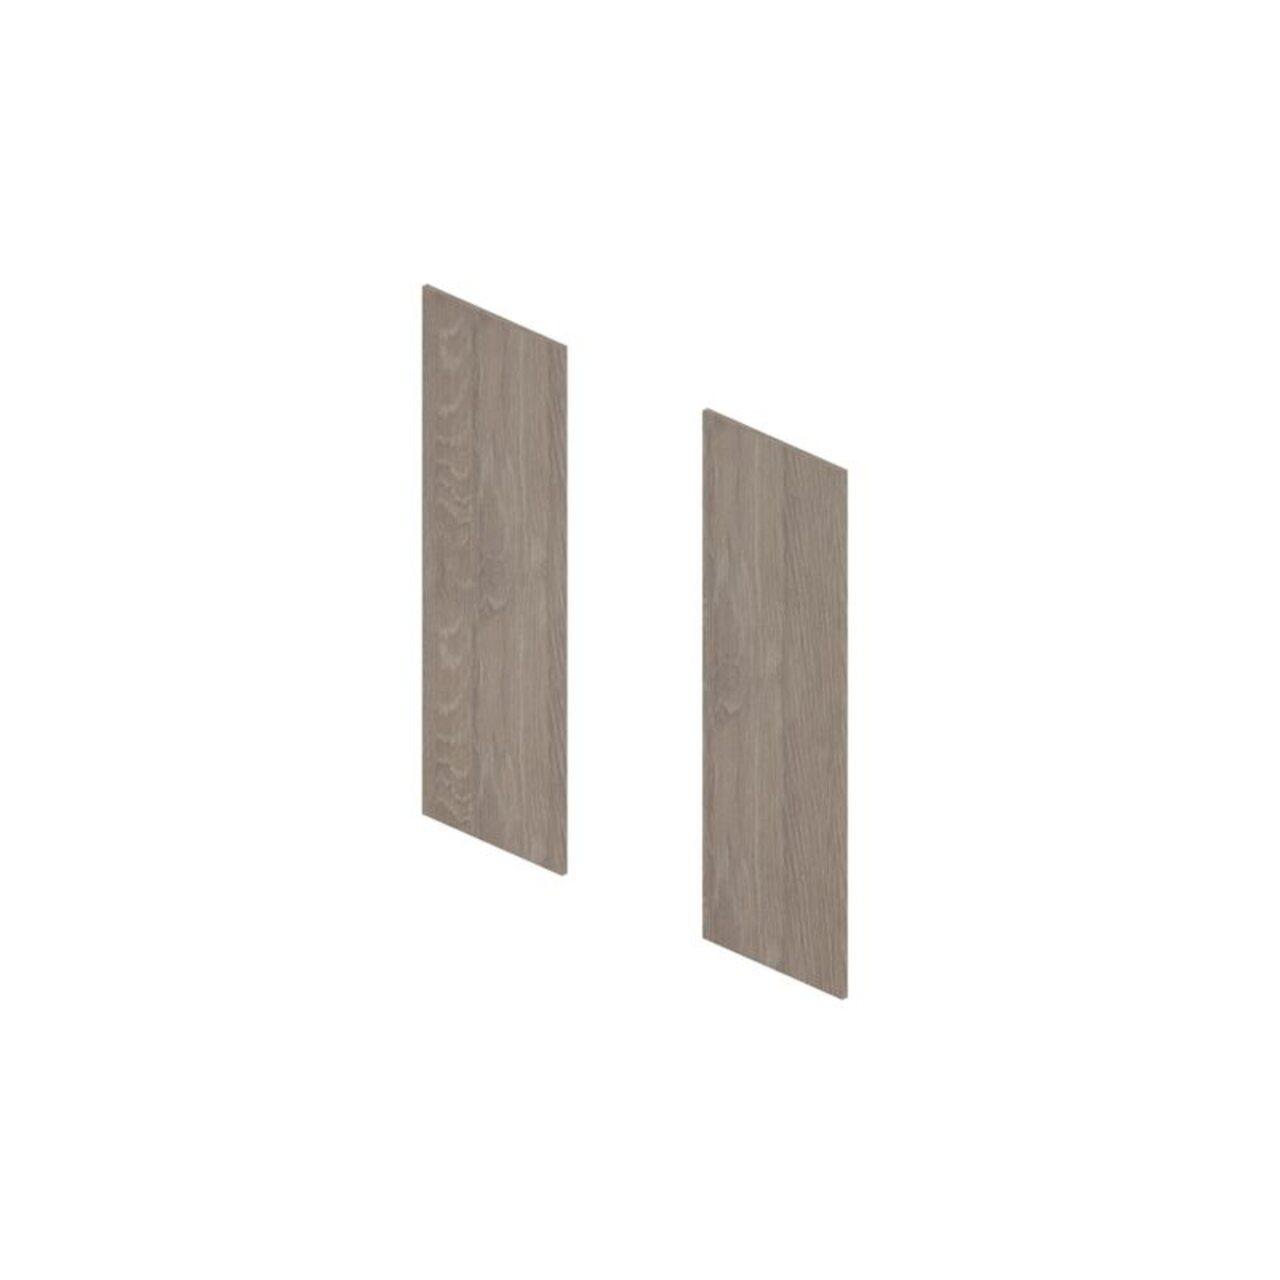 Раздвижные двери для стеллажа R-81  Rio 143x3x144 - фото 4